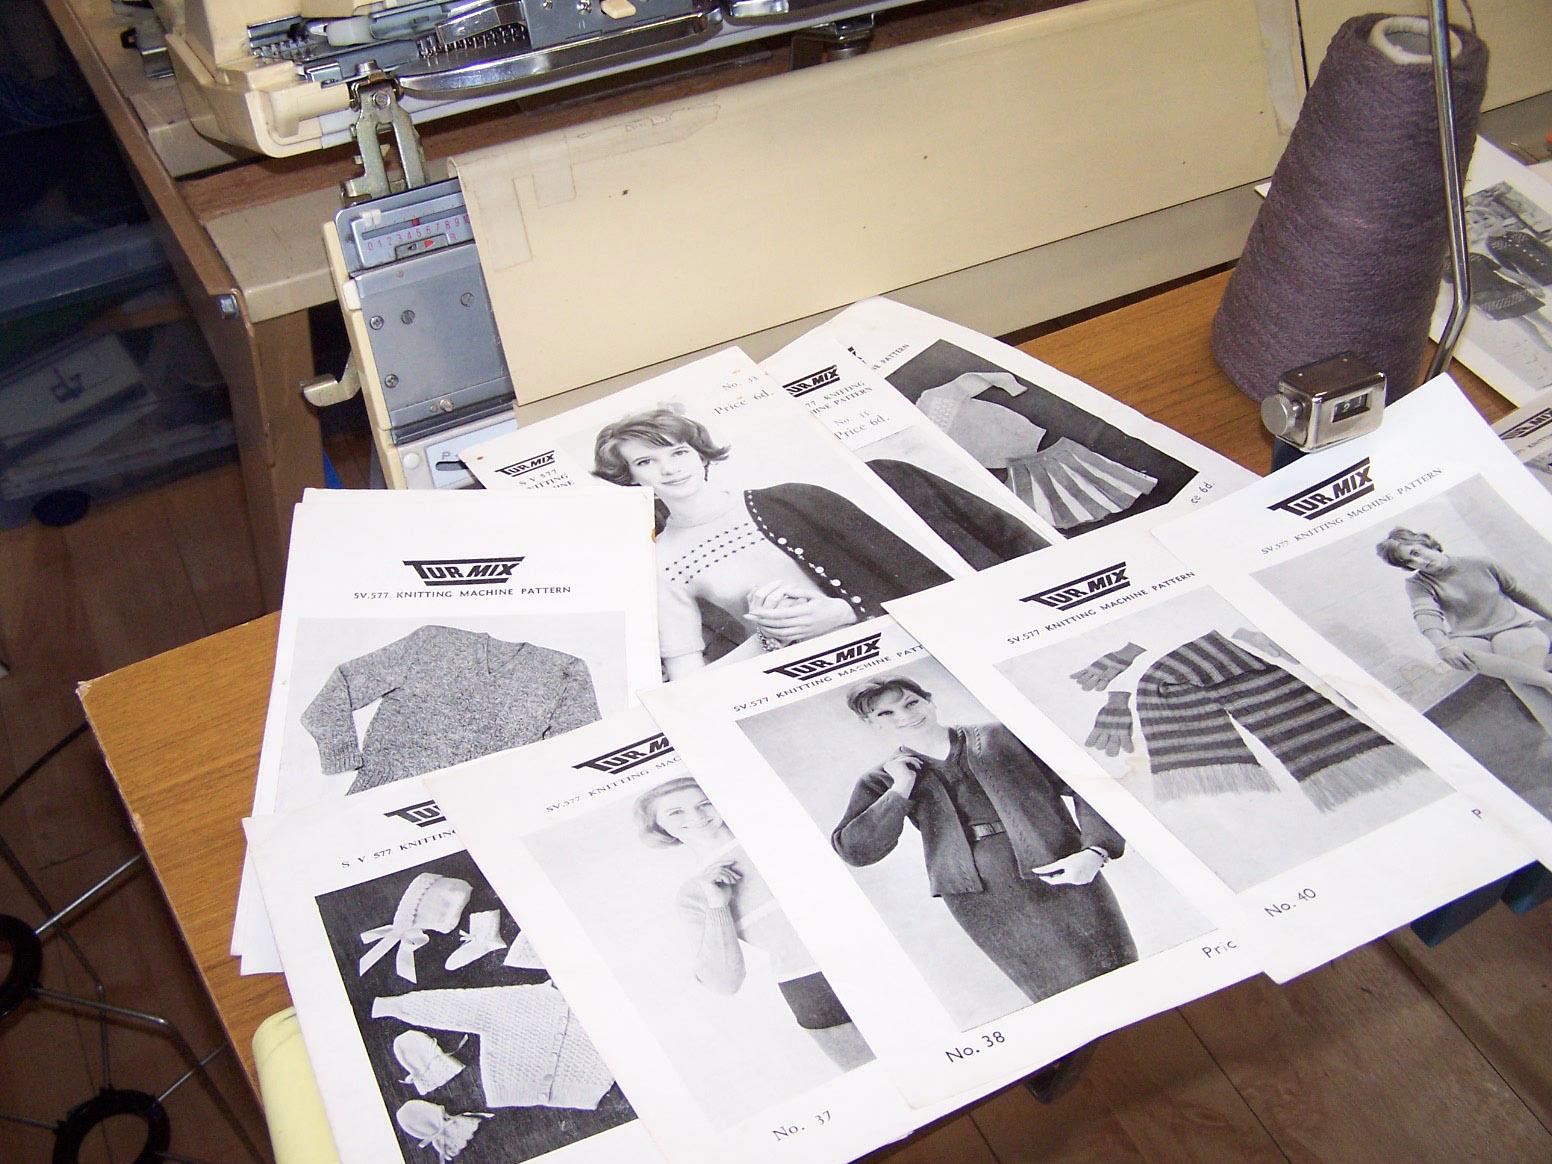 Turmix 577 patterns